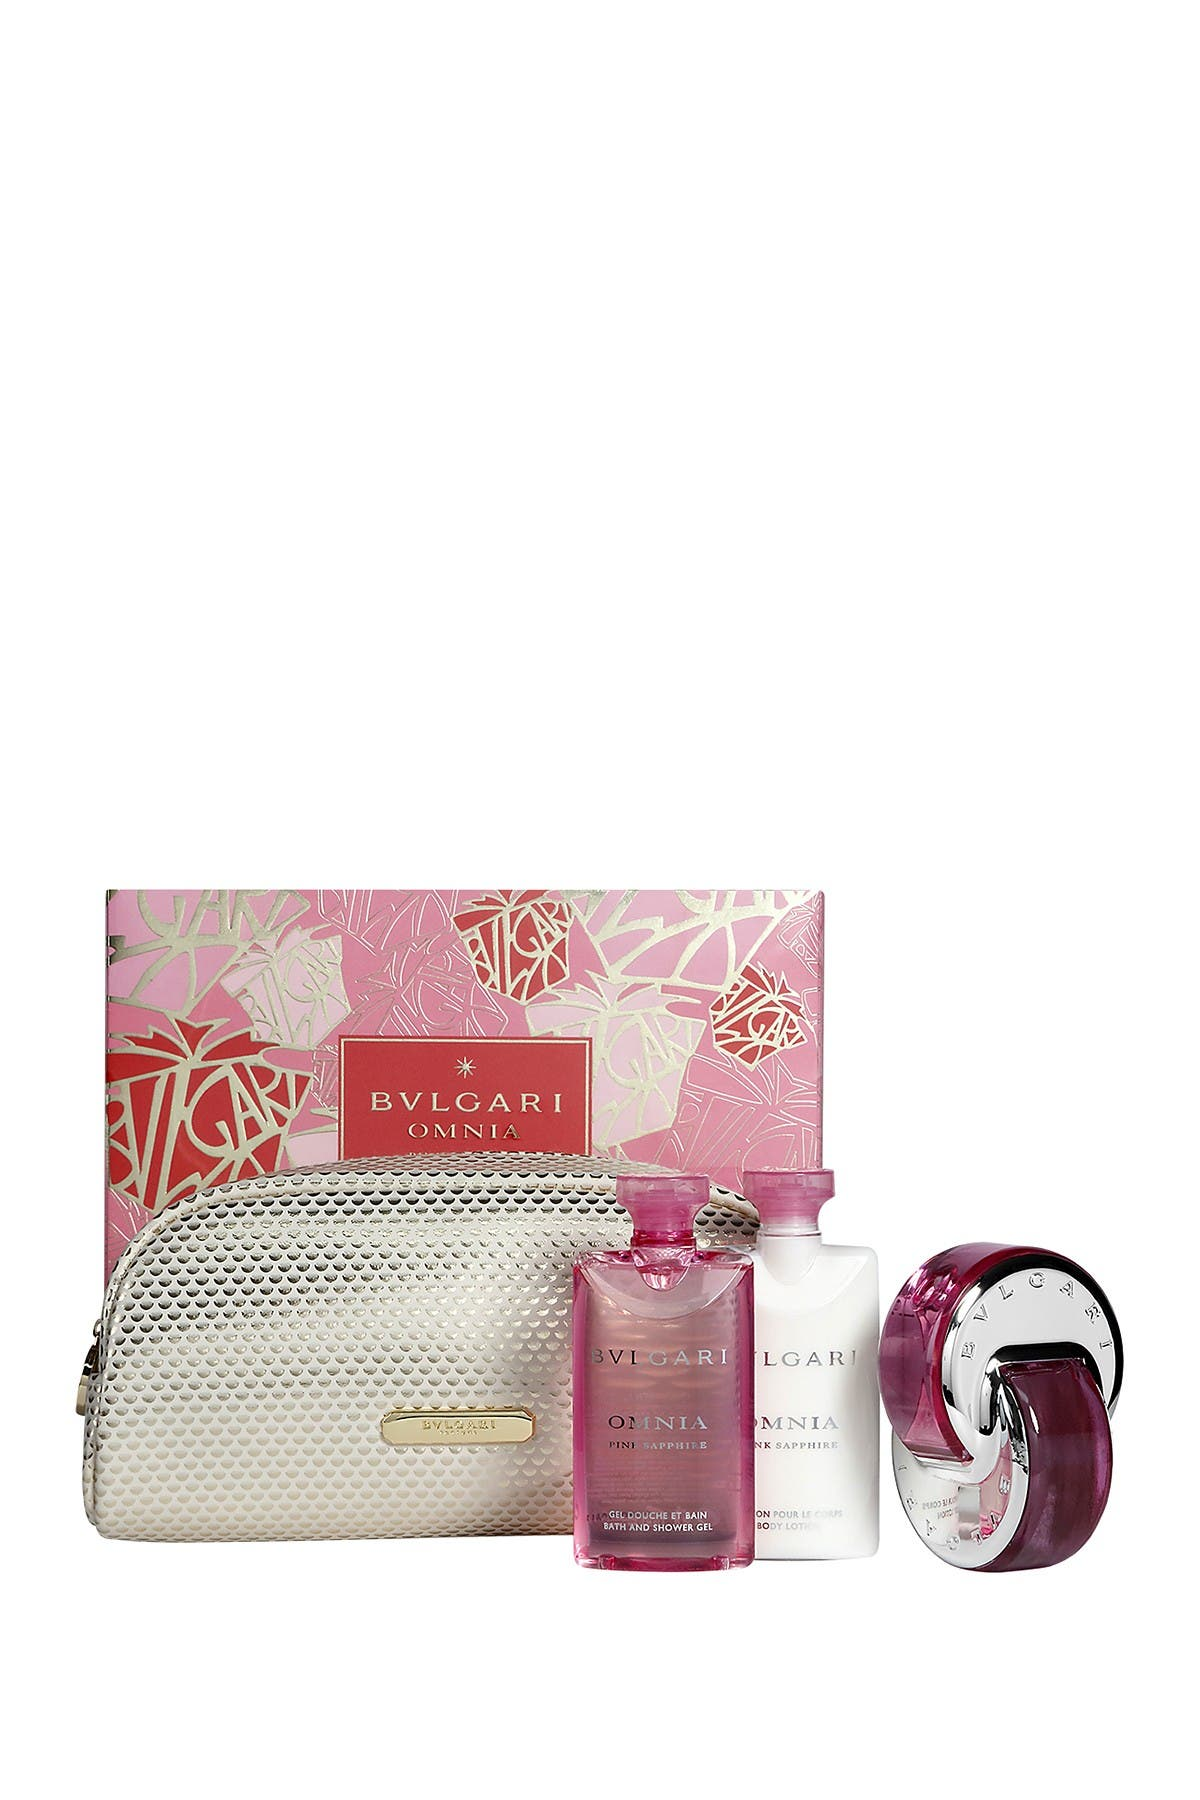 Image of Bvlgari Omnia Pink Sapphire Eau de Toilette 4-Piece Gift Set